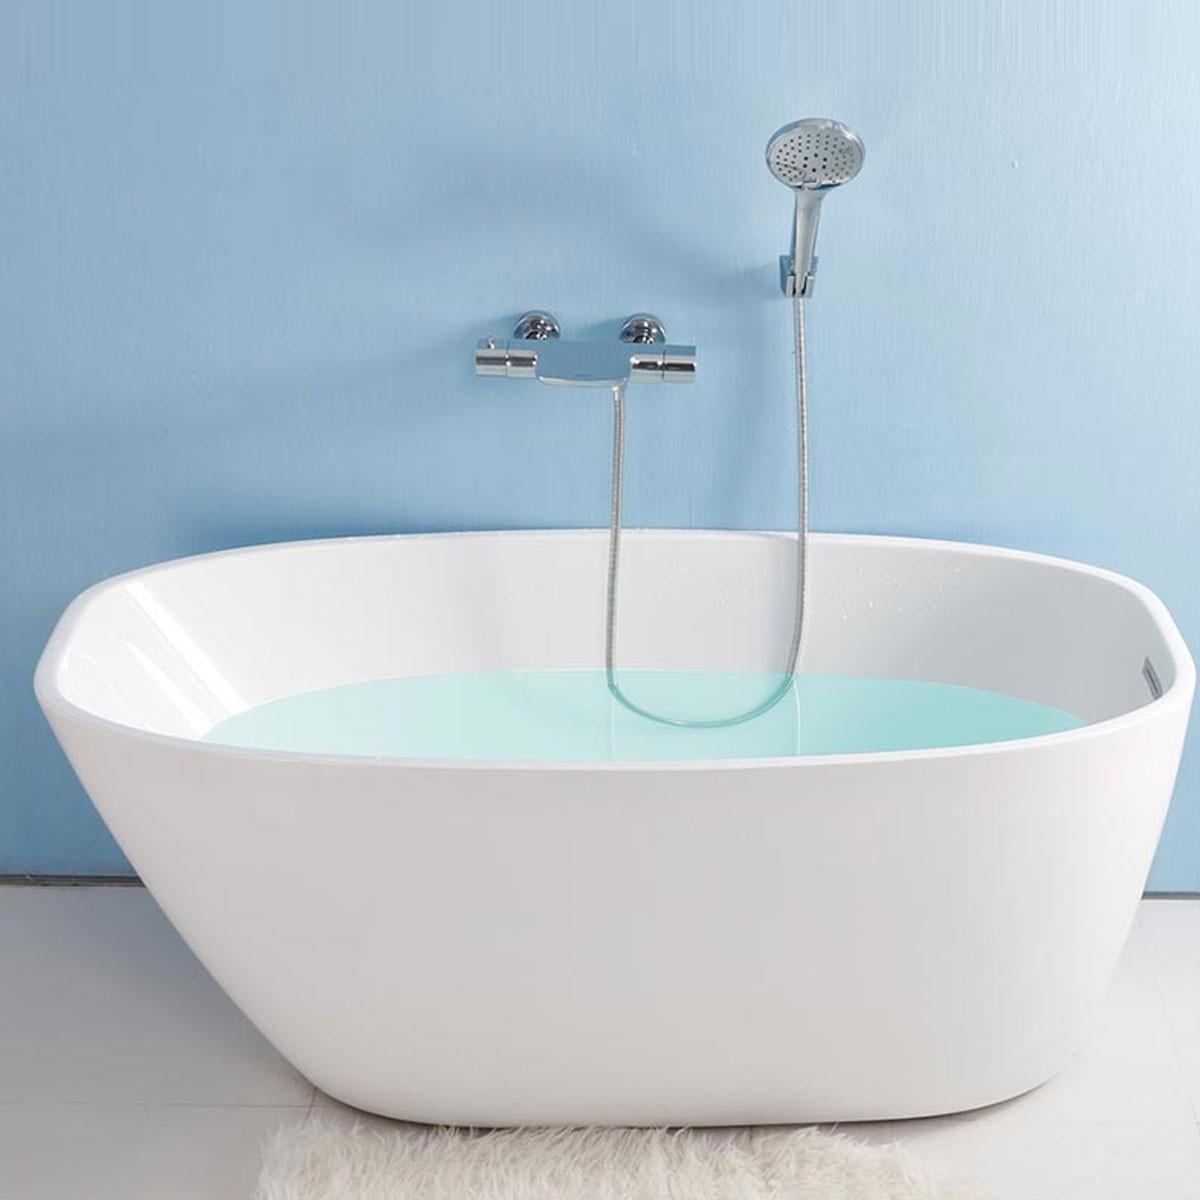 inflatable chair bed bath and beyond pottery barn ladder back chairs bathtub ez bathe air washing